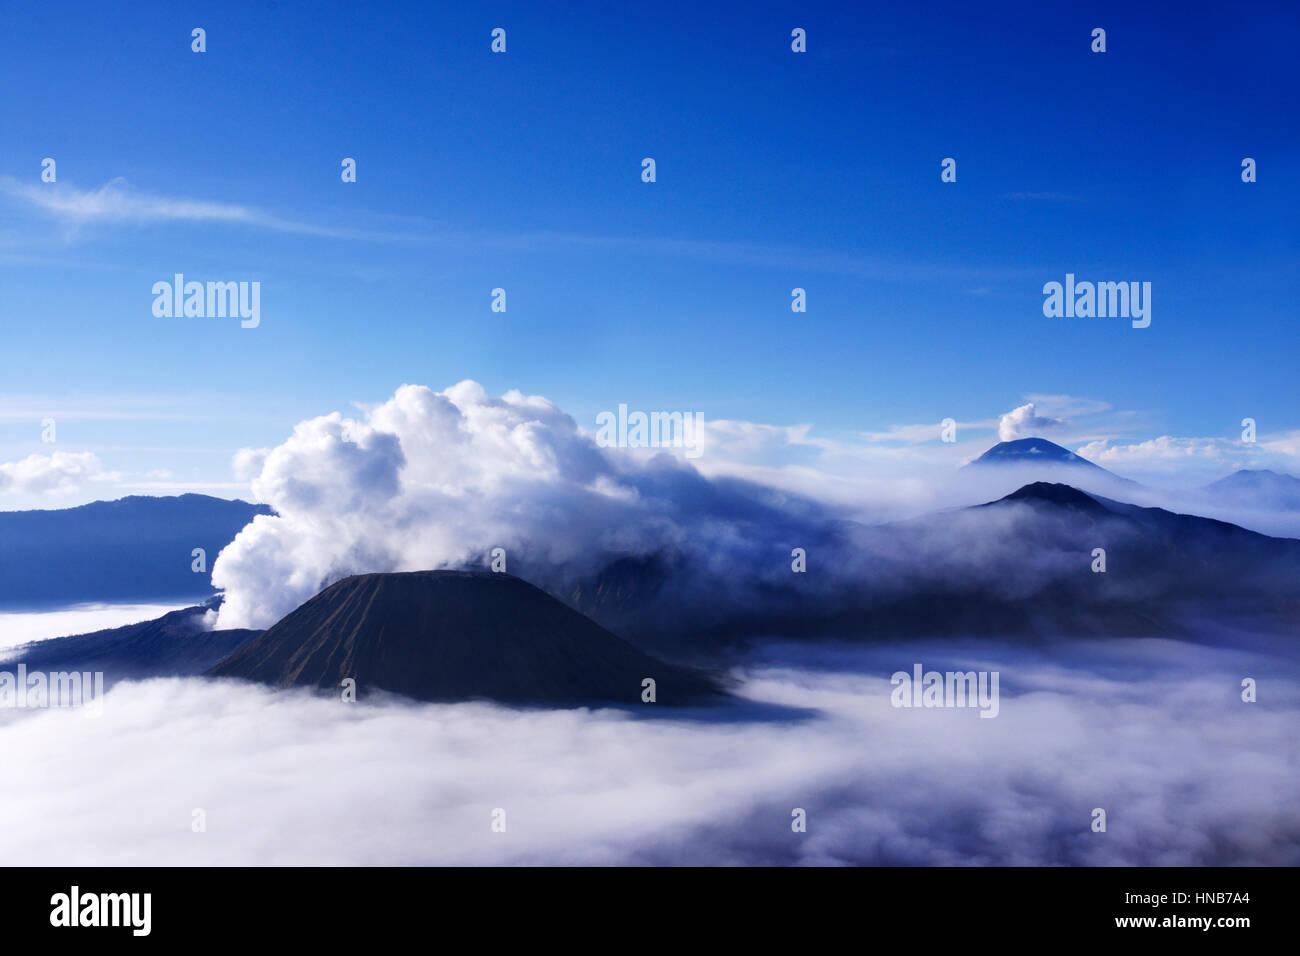 Volcanoes seen from Mount Penanjakan Indonesia. - Stock Image